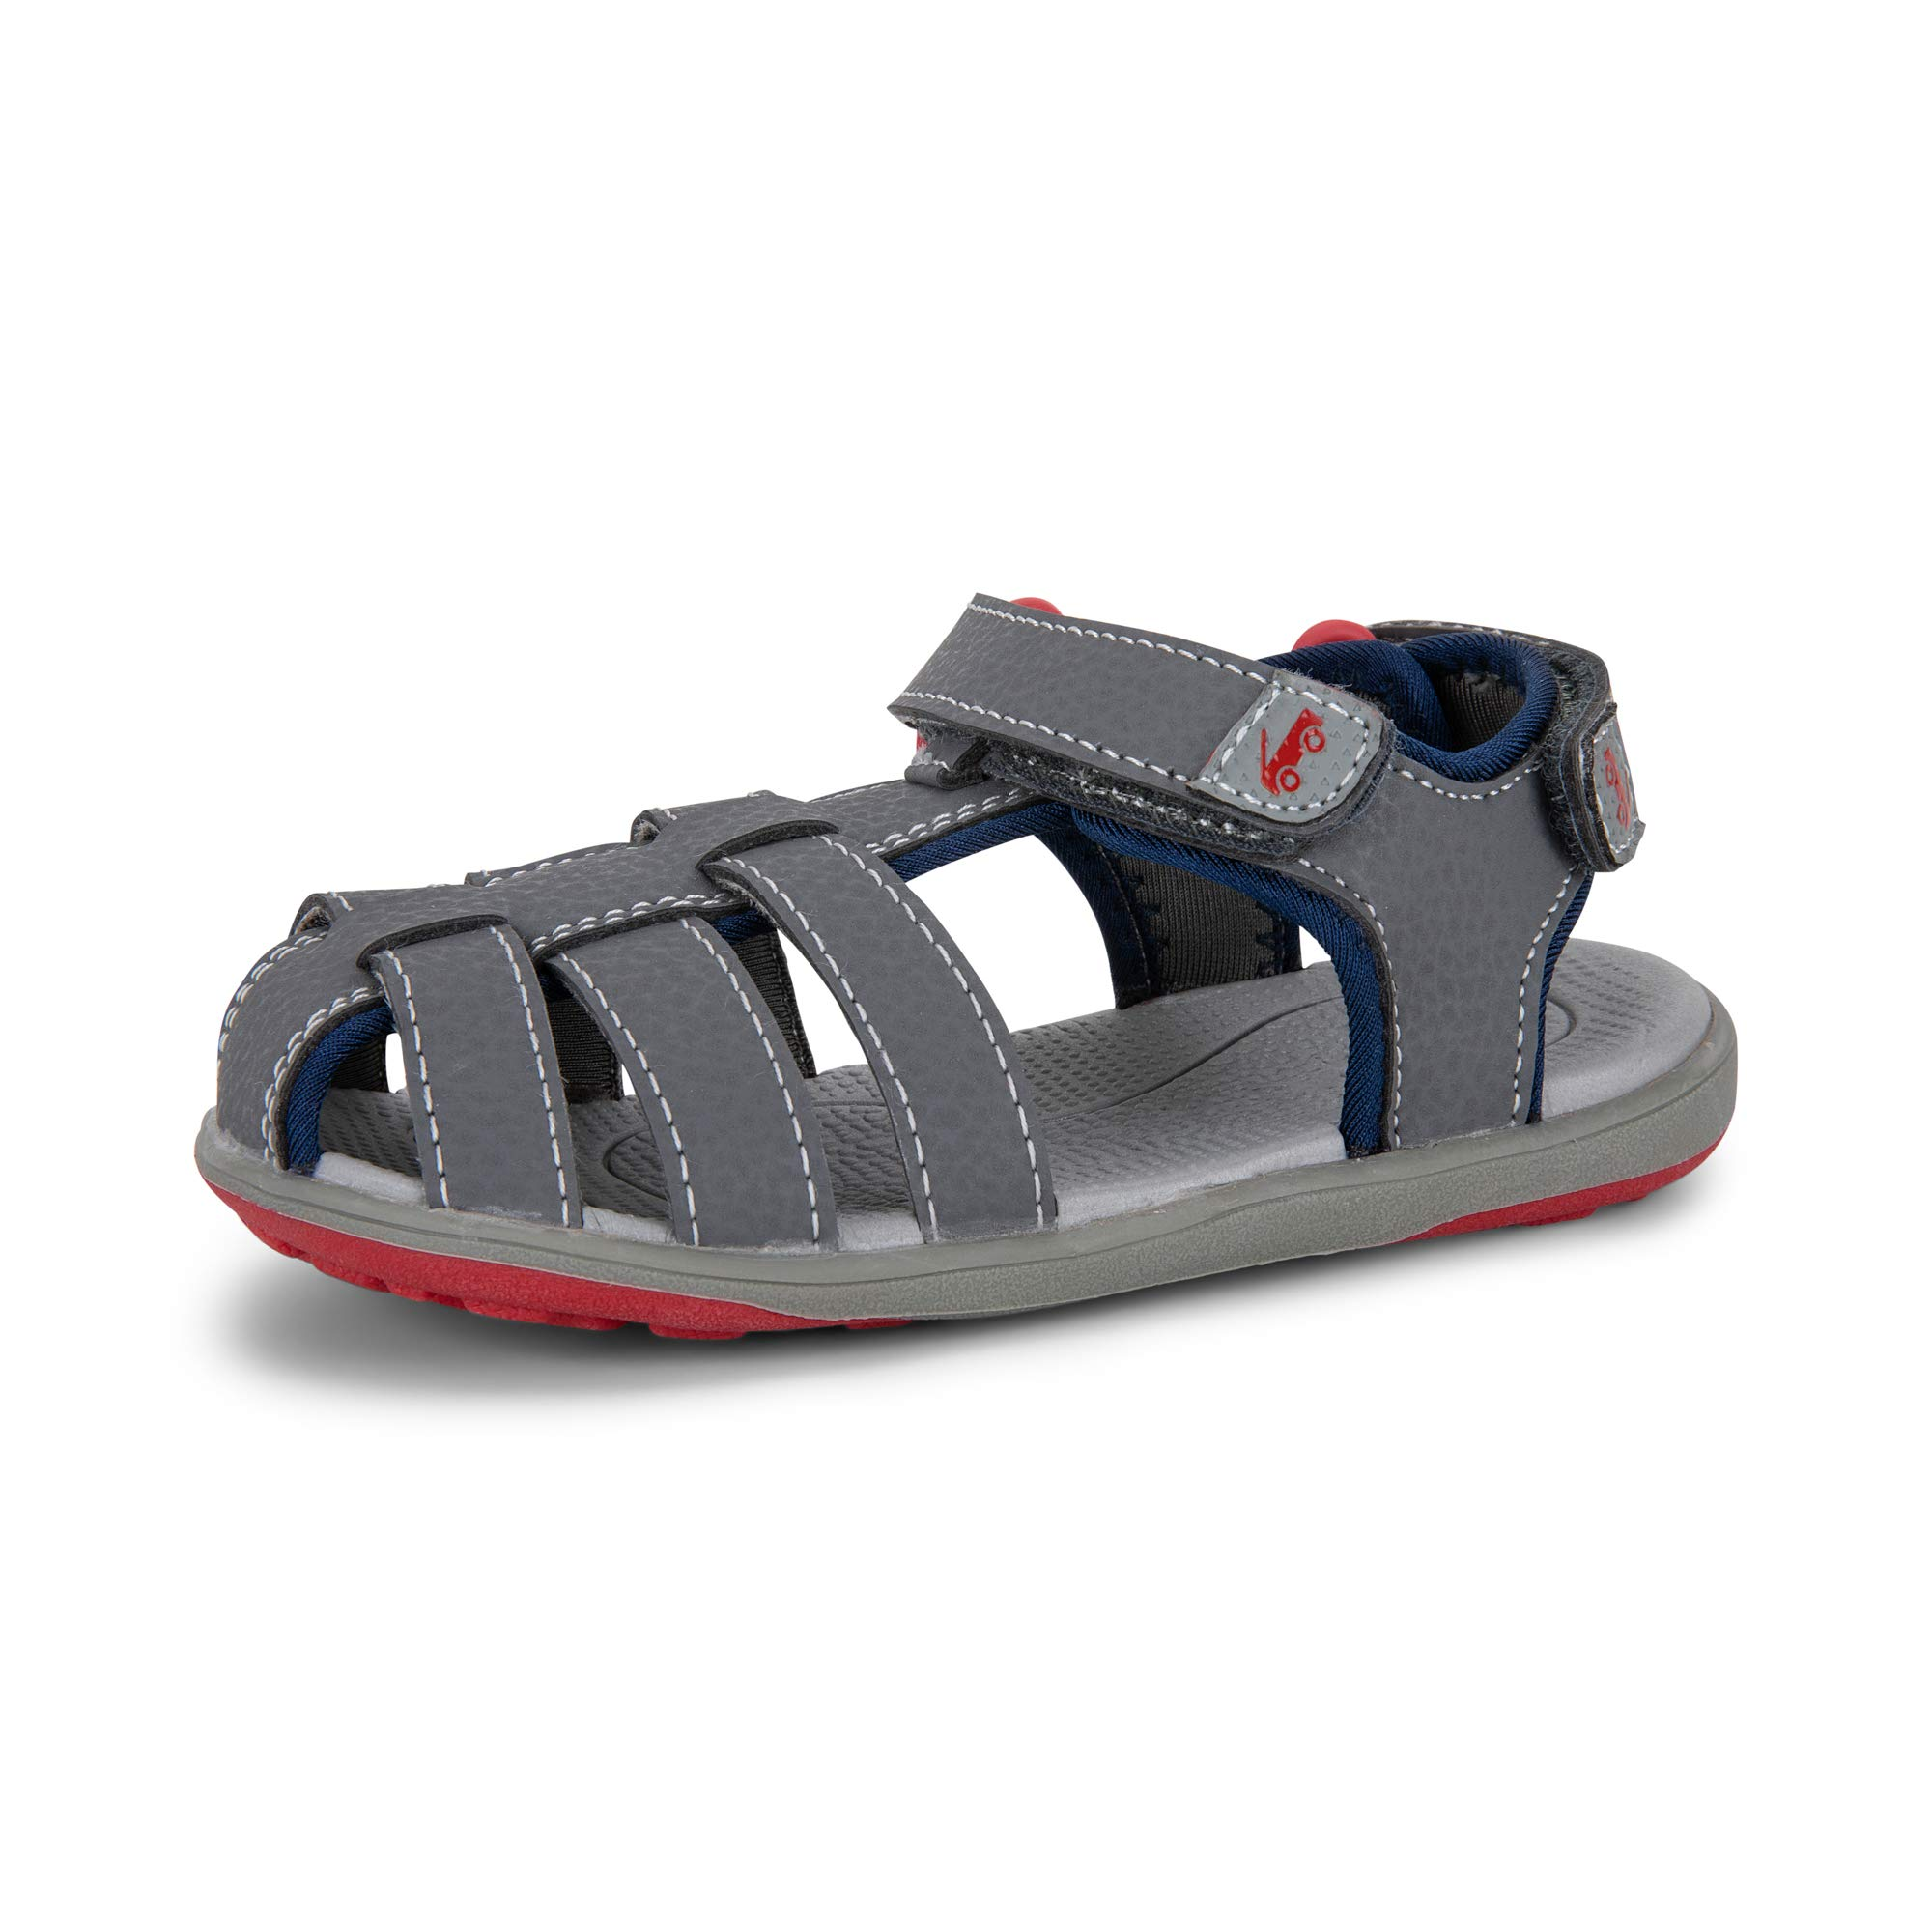 See Kai Run - Cyrus III Water-Friendly Sandals for Kids, Gray, 9 by See Kai Run